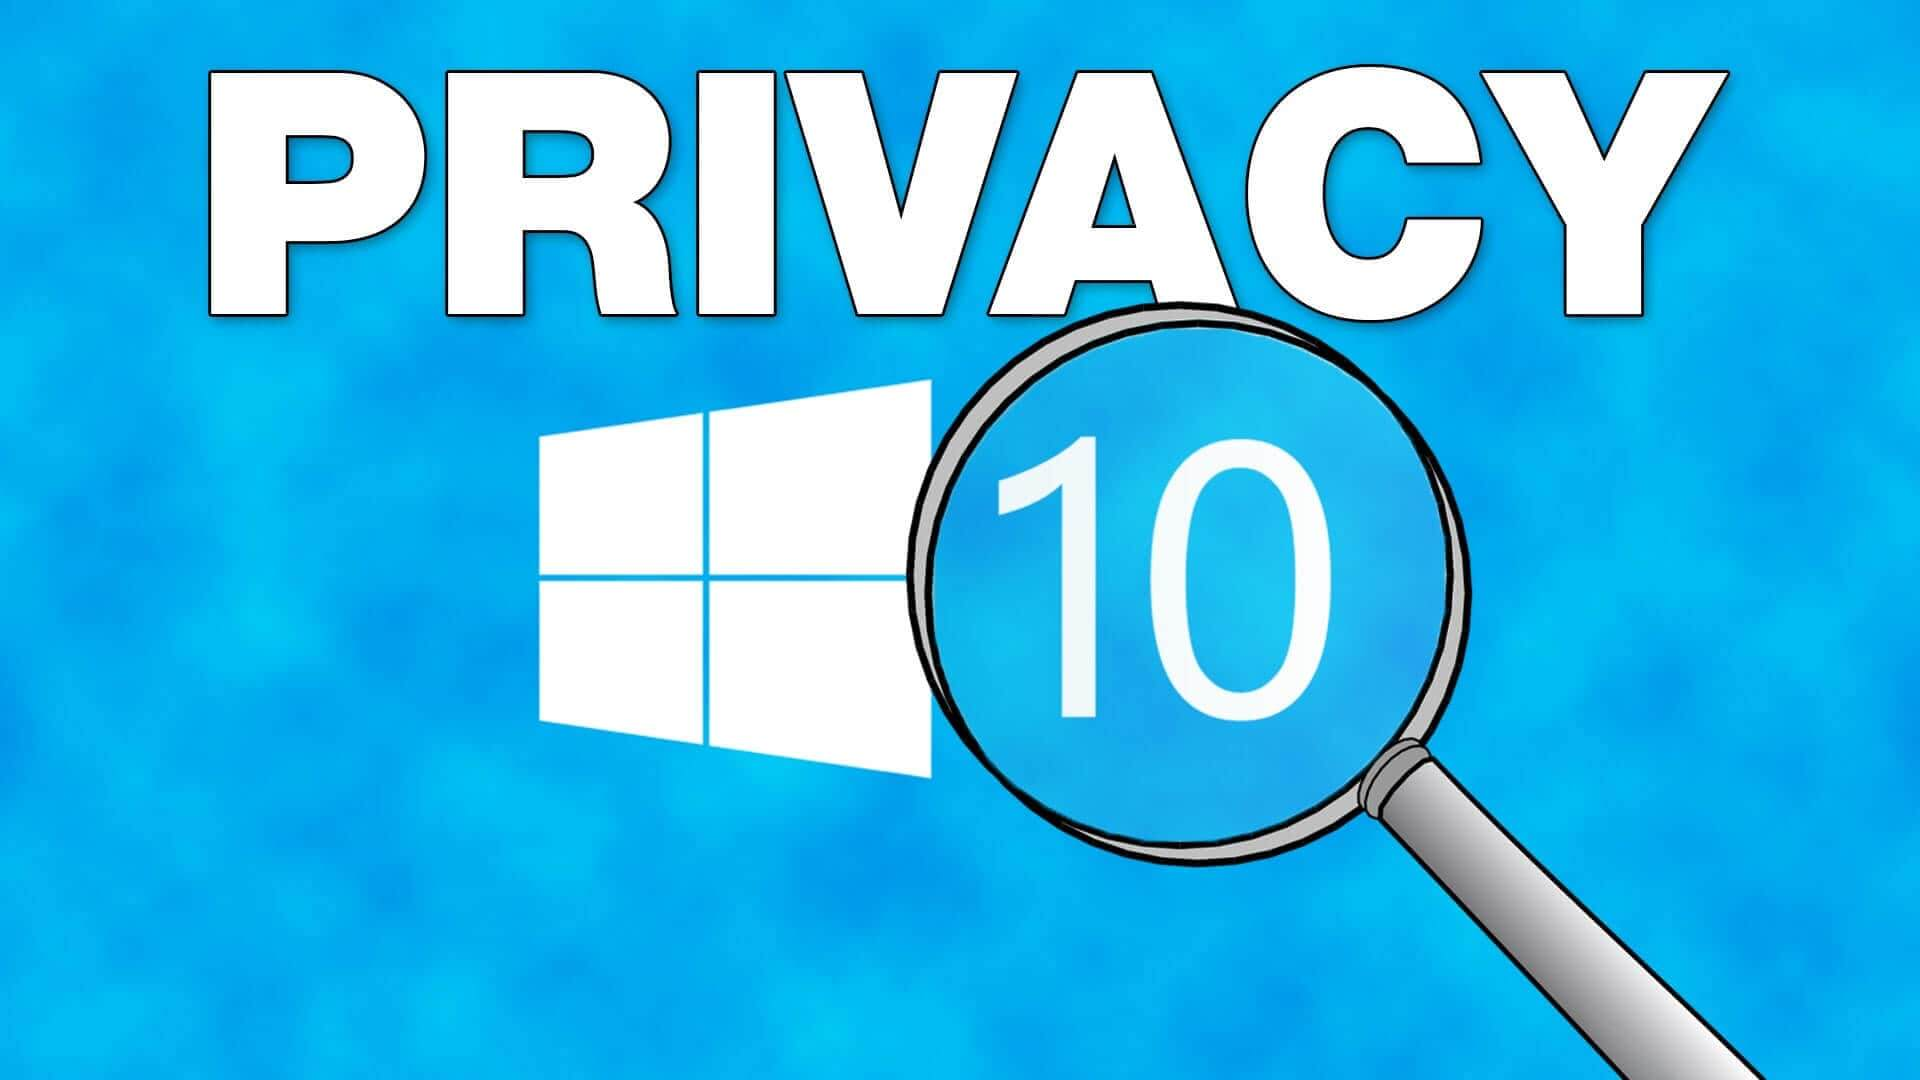 Microsoft Windows 10 breaches Dutch privacy law